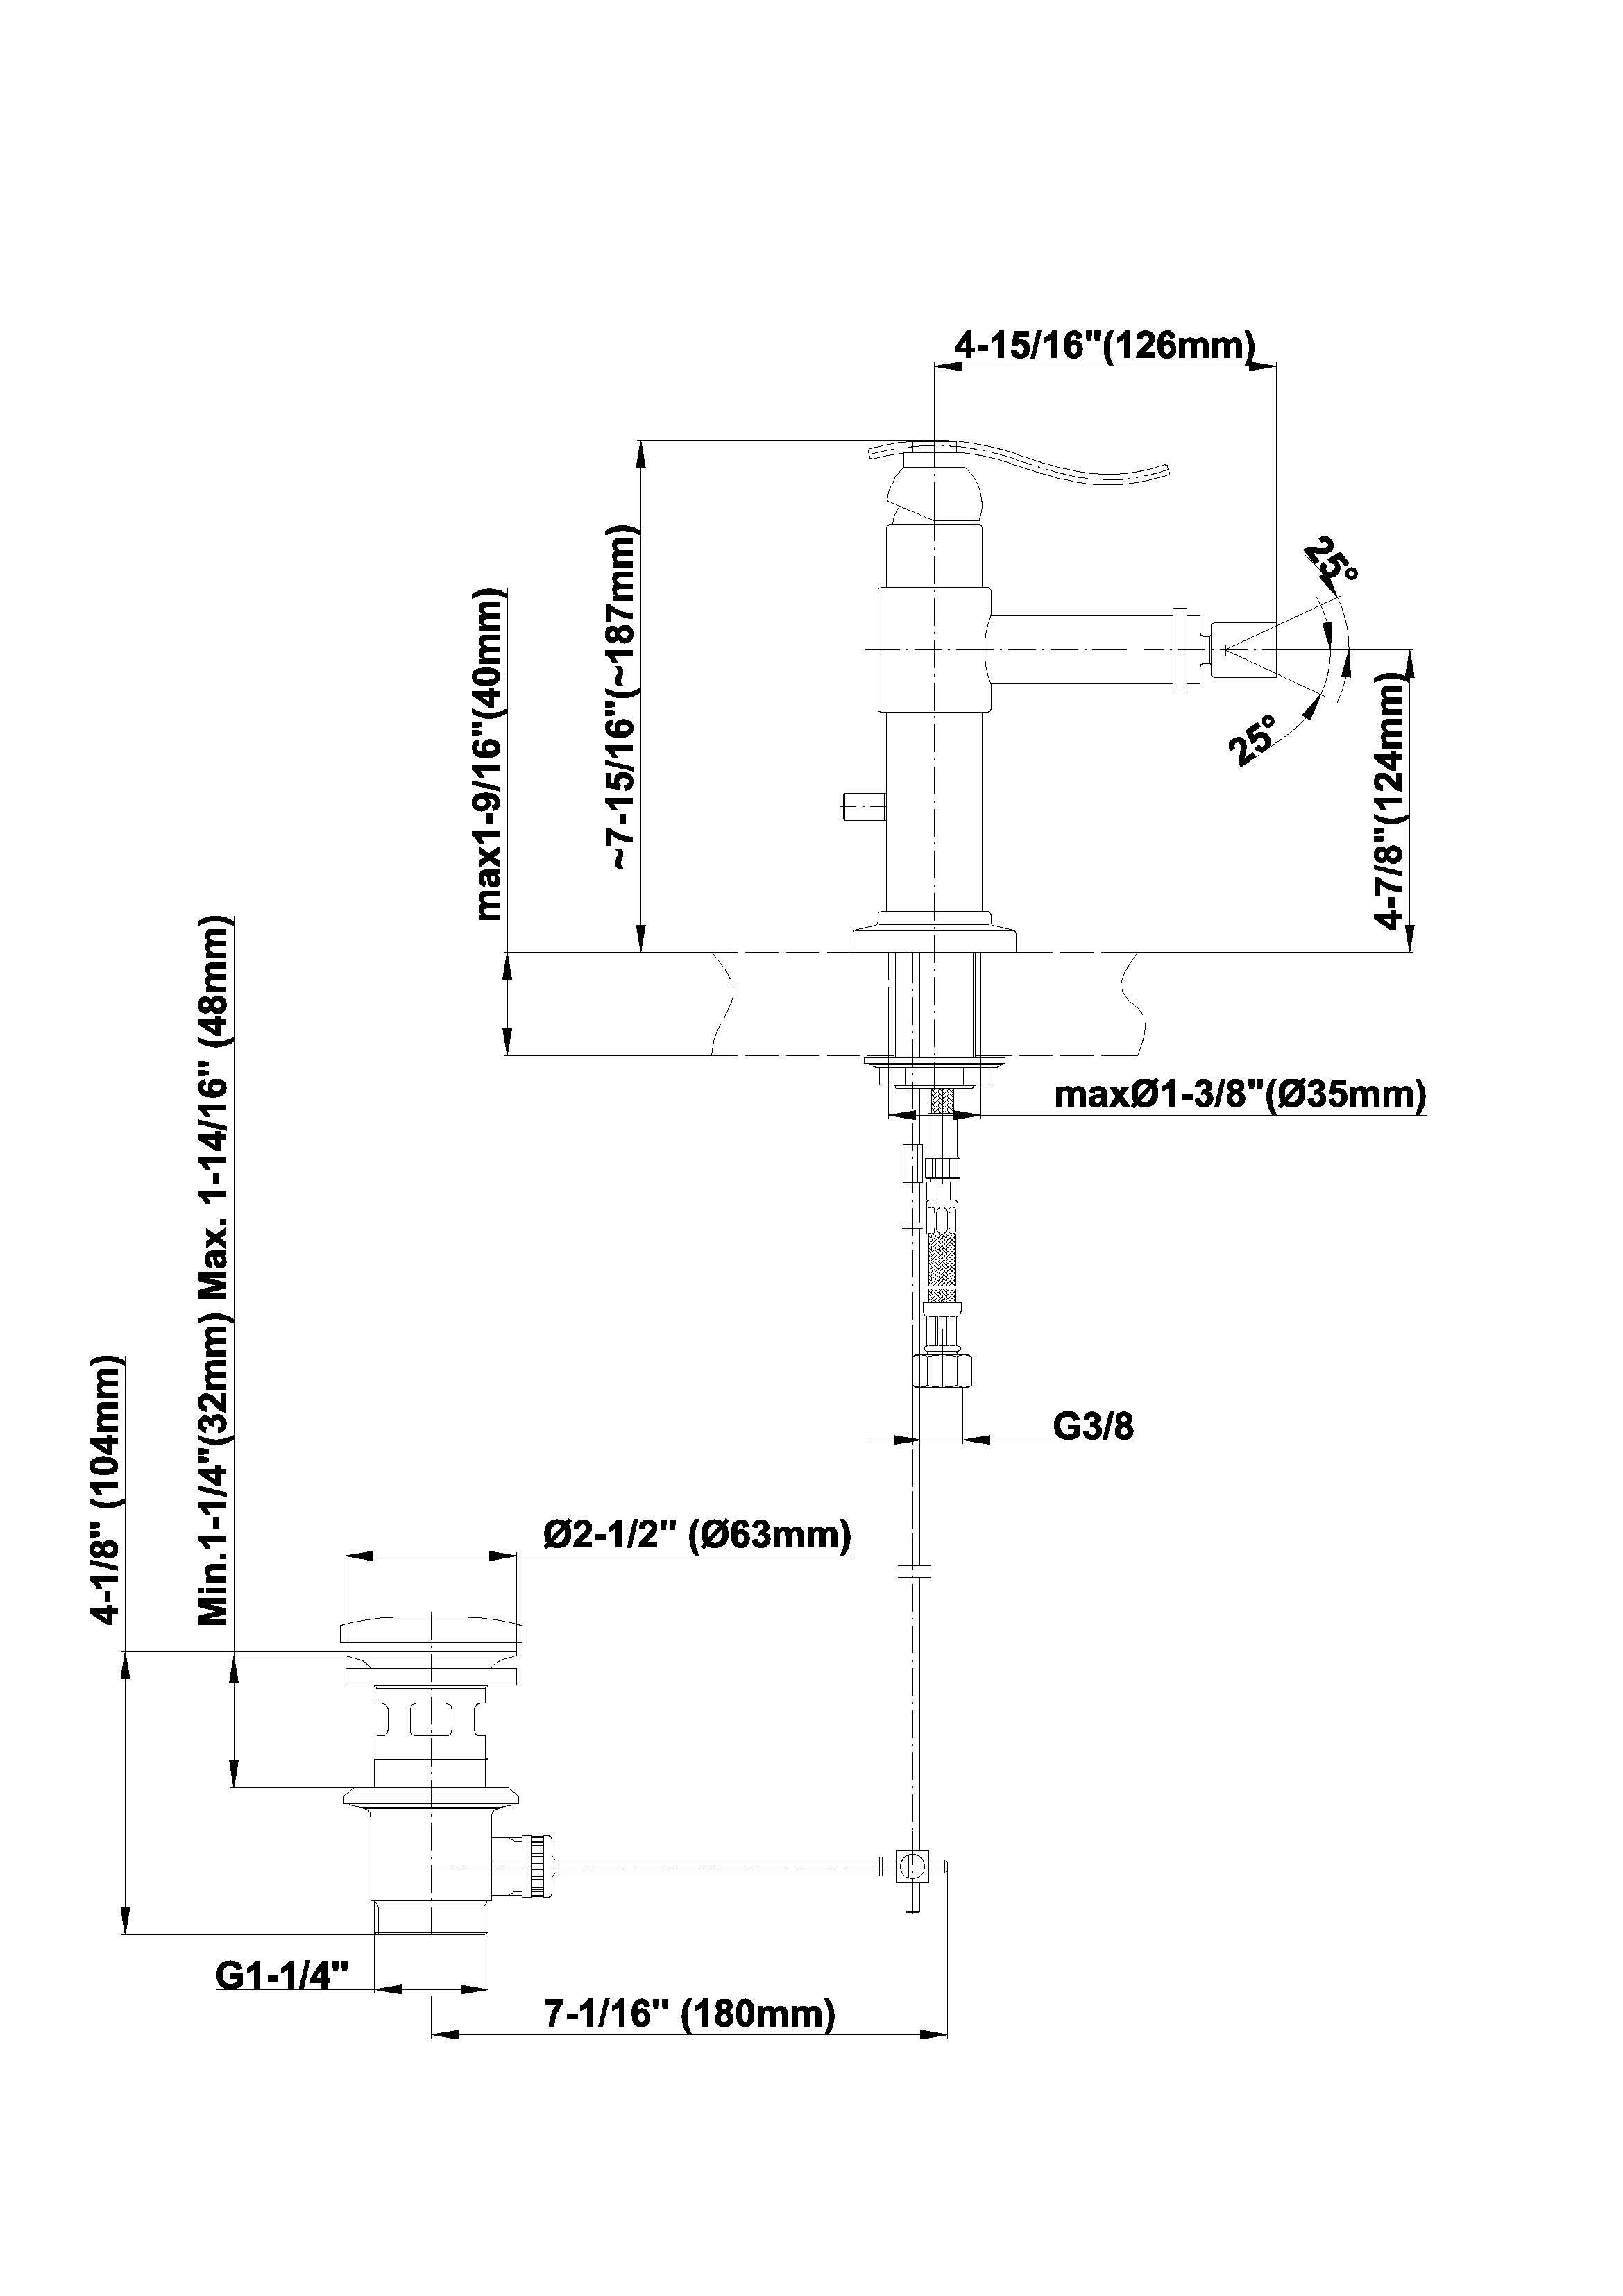 Baterie monocomanda bideu mini Graff Bali 2368600 Fisa tehnica